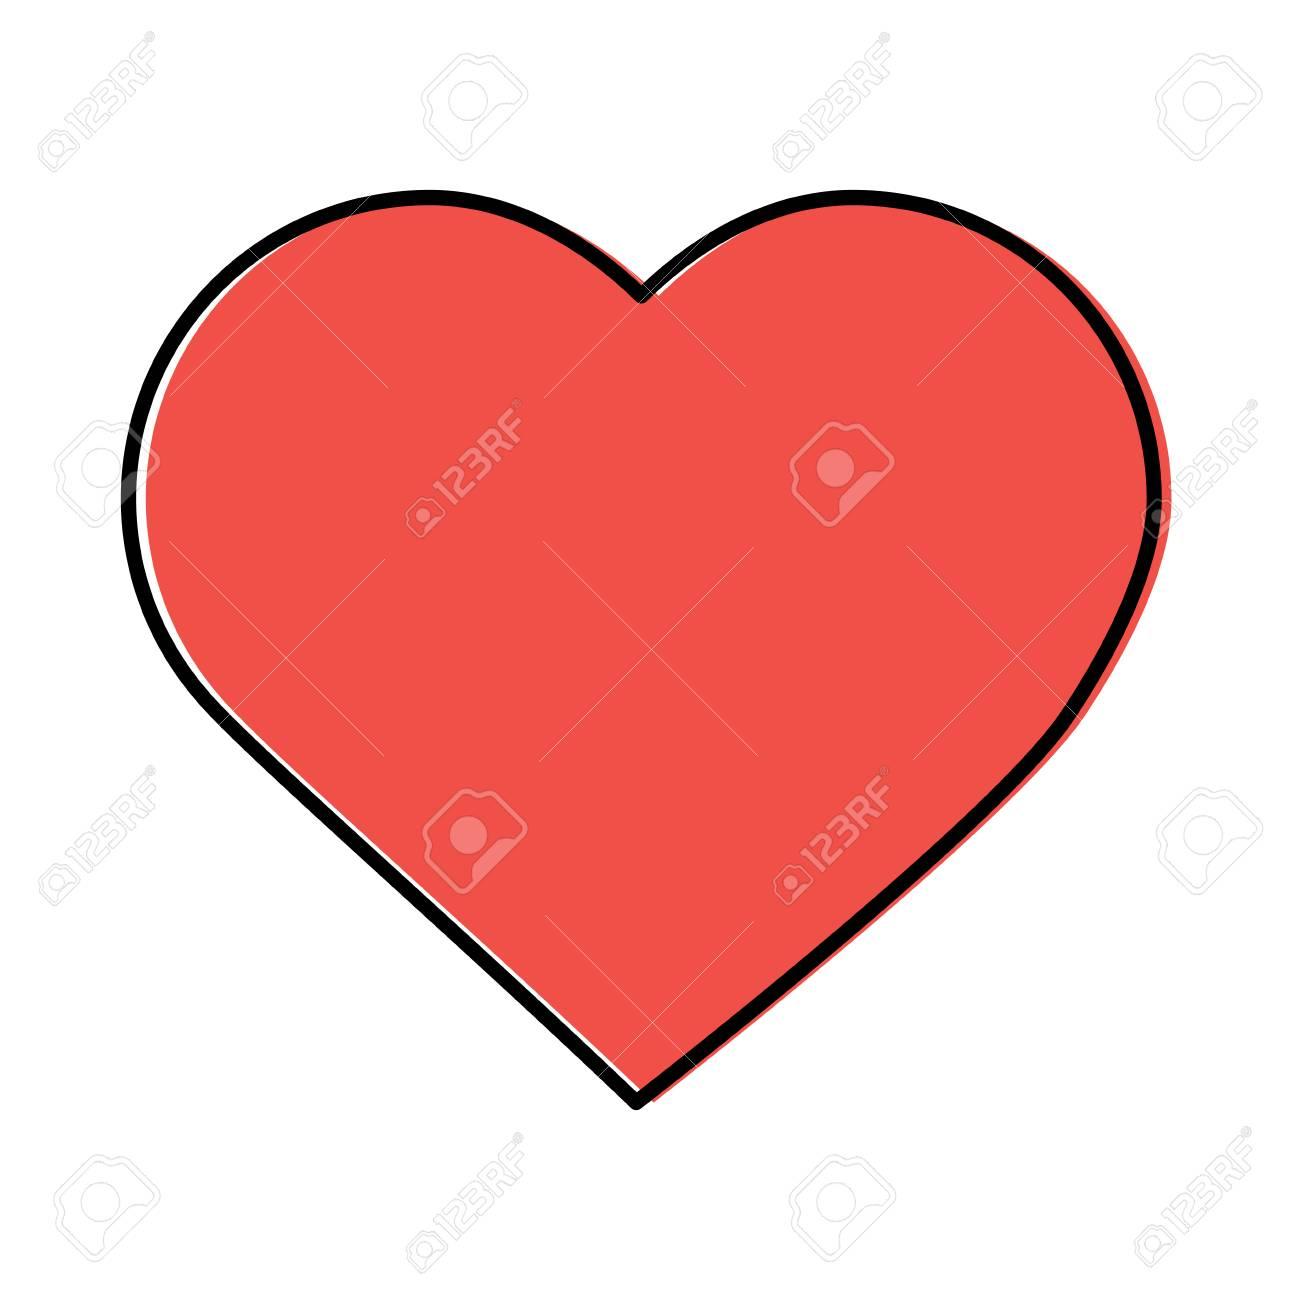 Idees De Fait Main Coeur Dessin